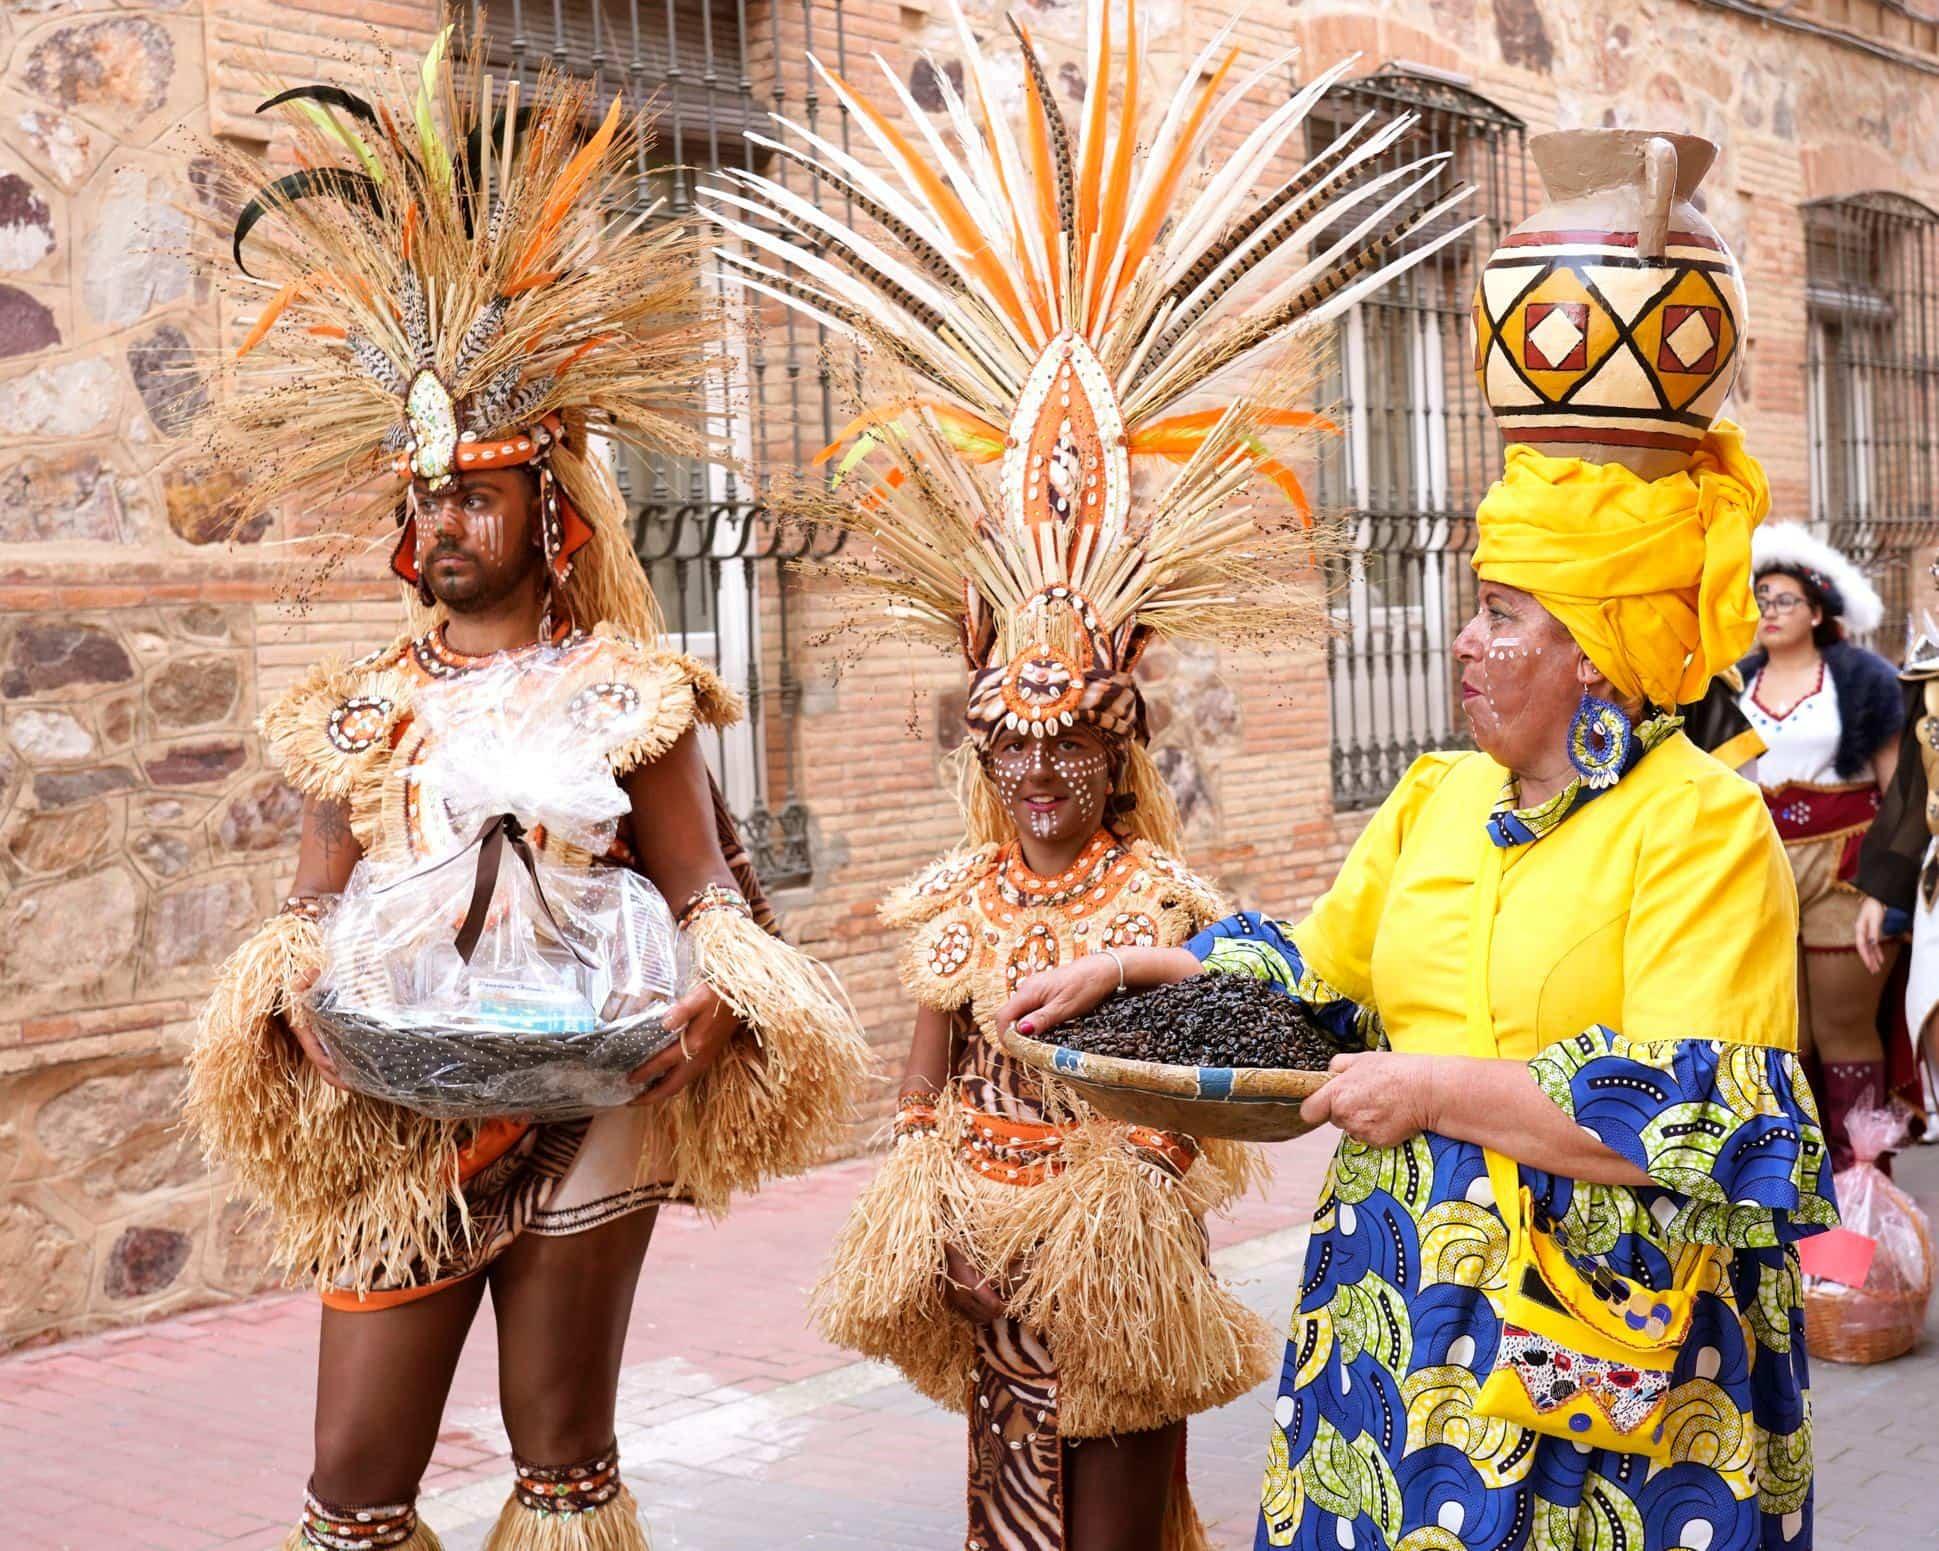 Carnaval de herencia 2020 ofertorio 93 - Selección de fotografías del Ofertorio del Carnaval de Herencia